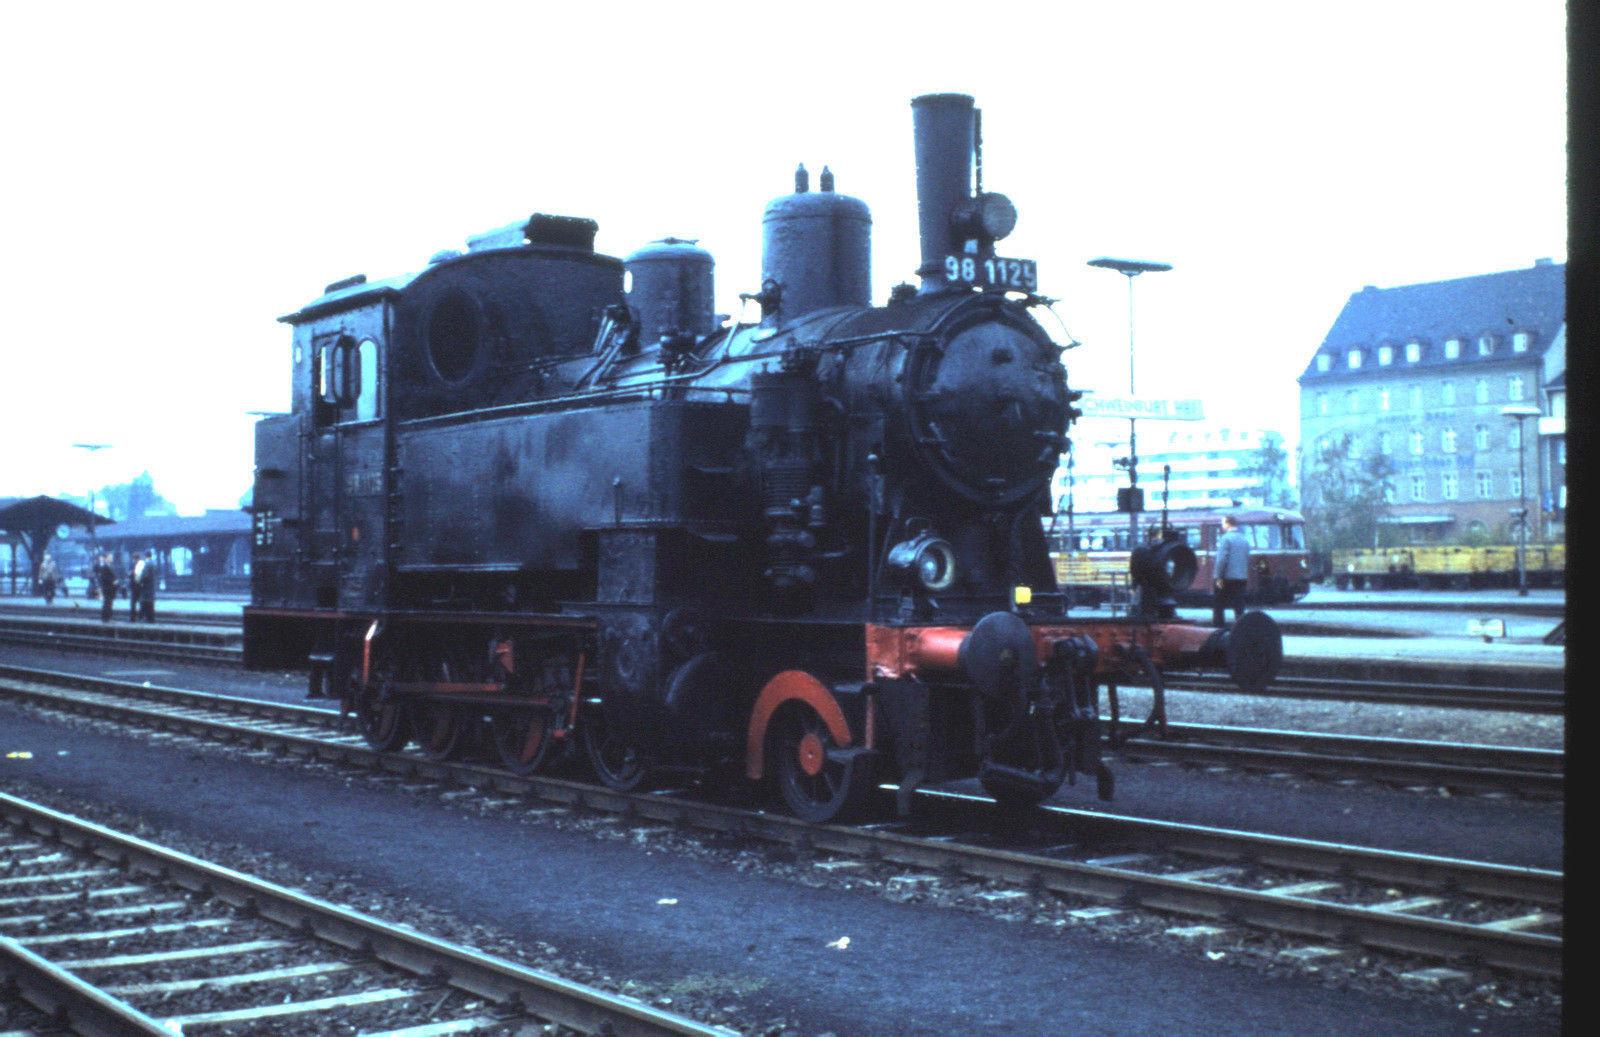 981125 in Schweinfurt